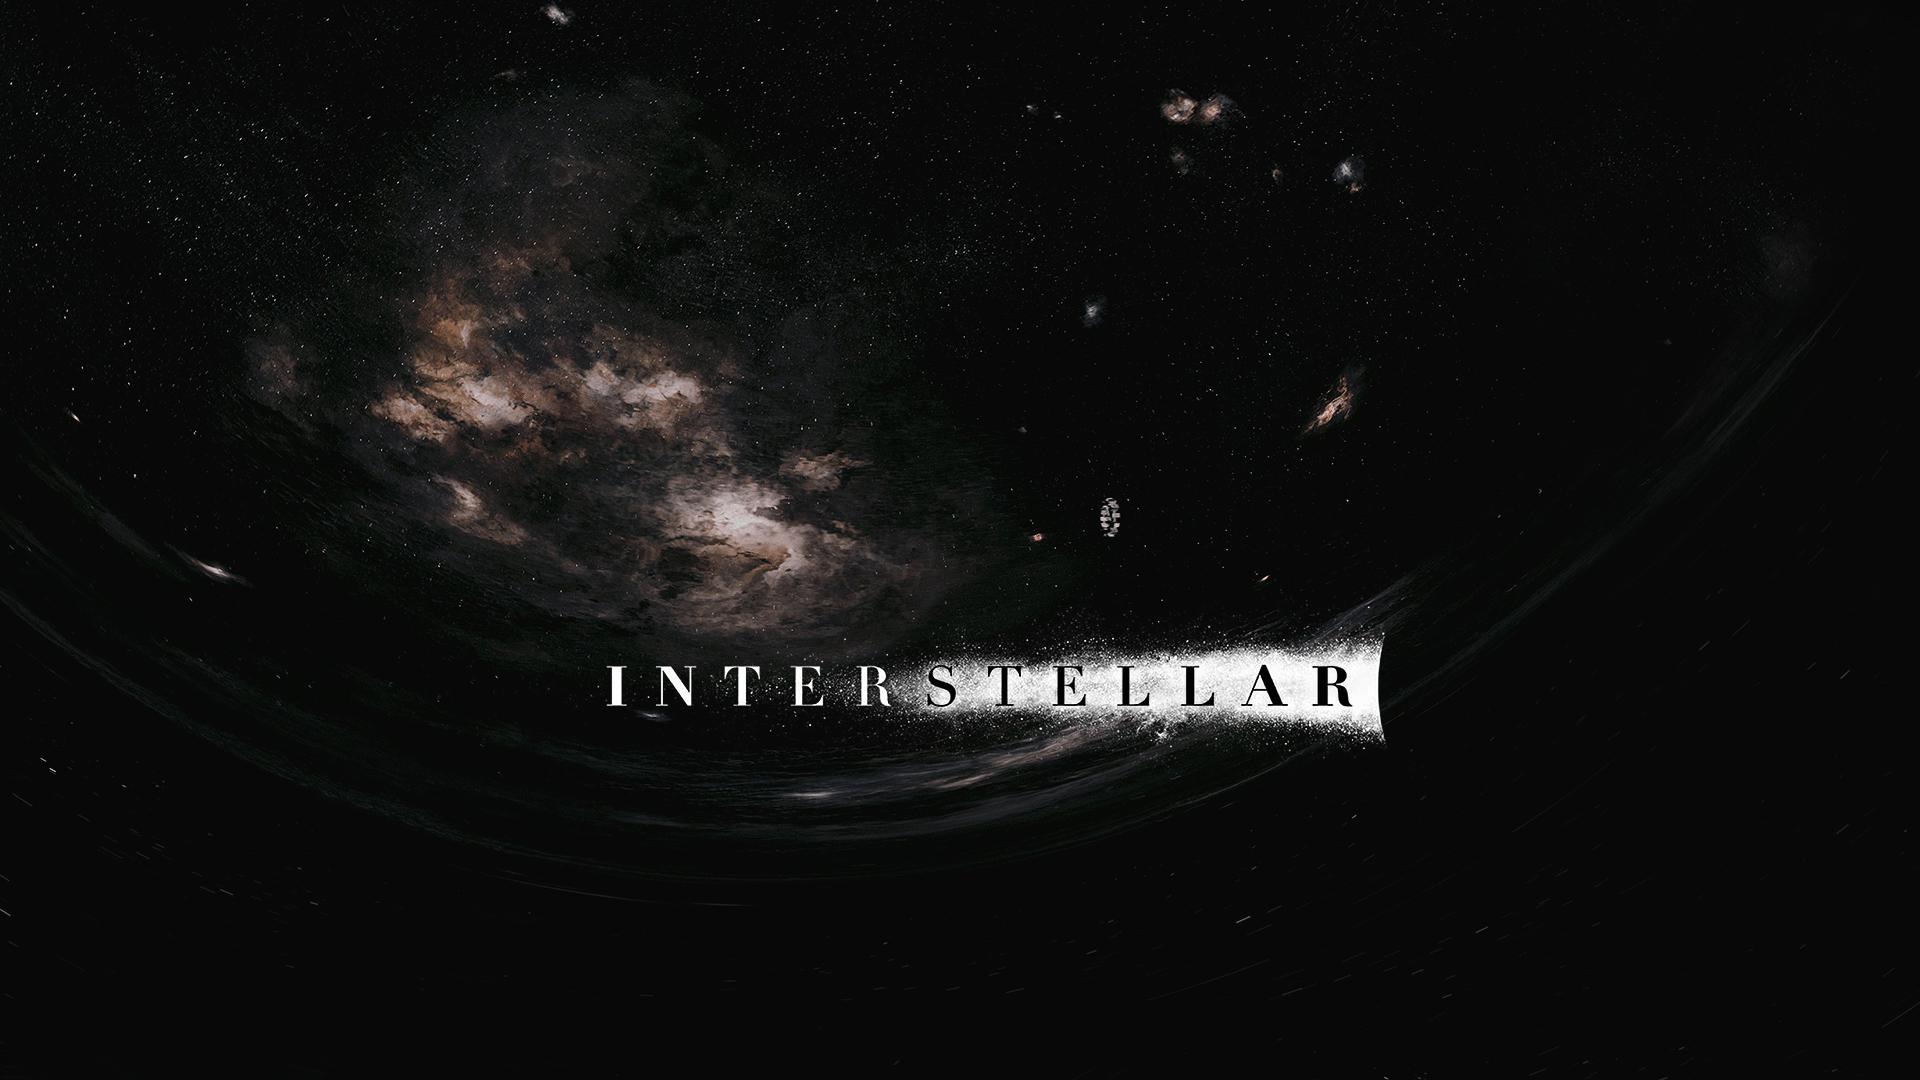 Interstellar Wallpapers - Wallpaper Cave